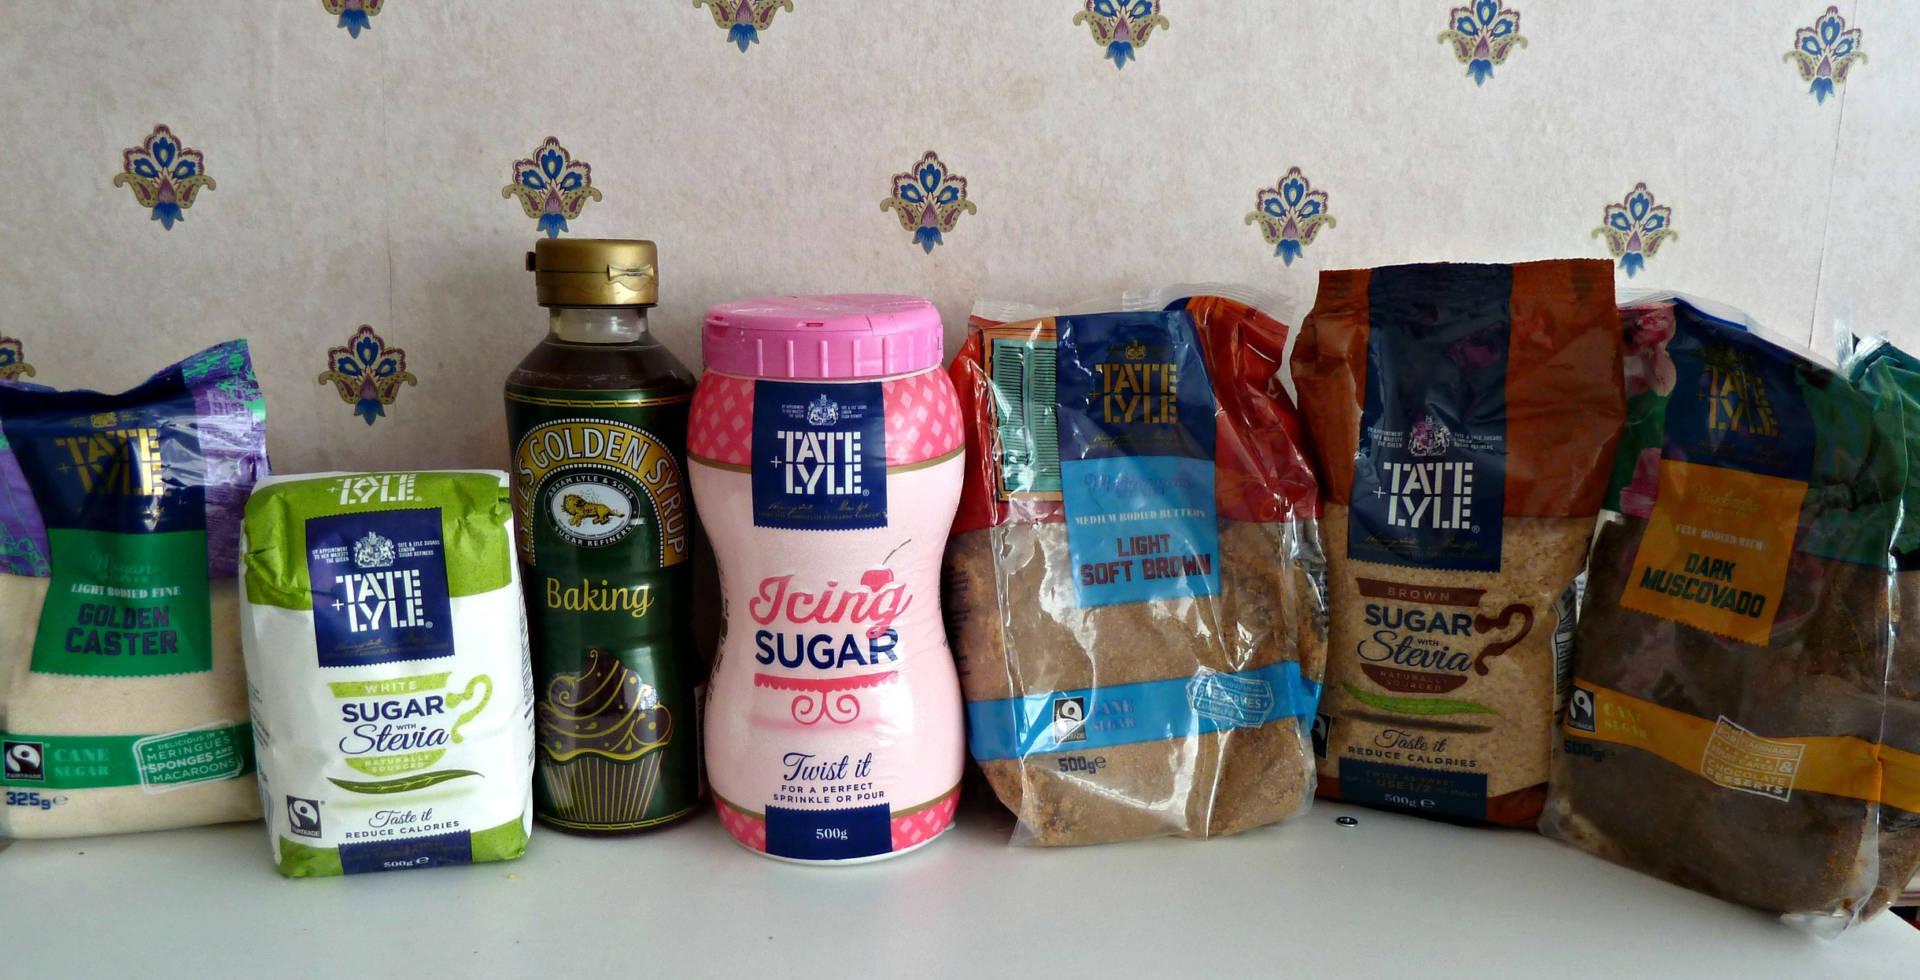 Tate and lyle sugar